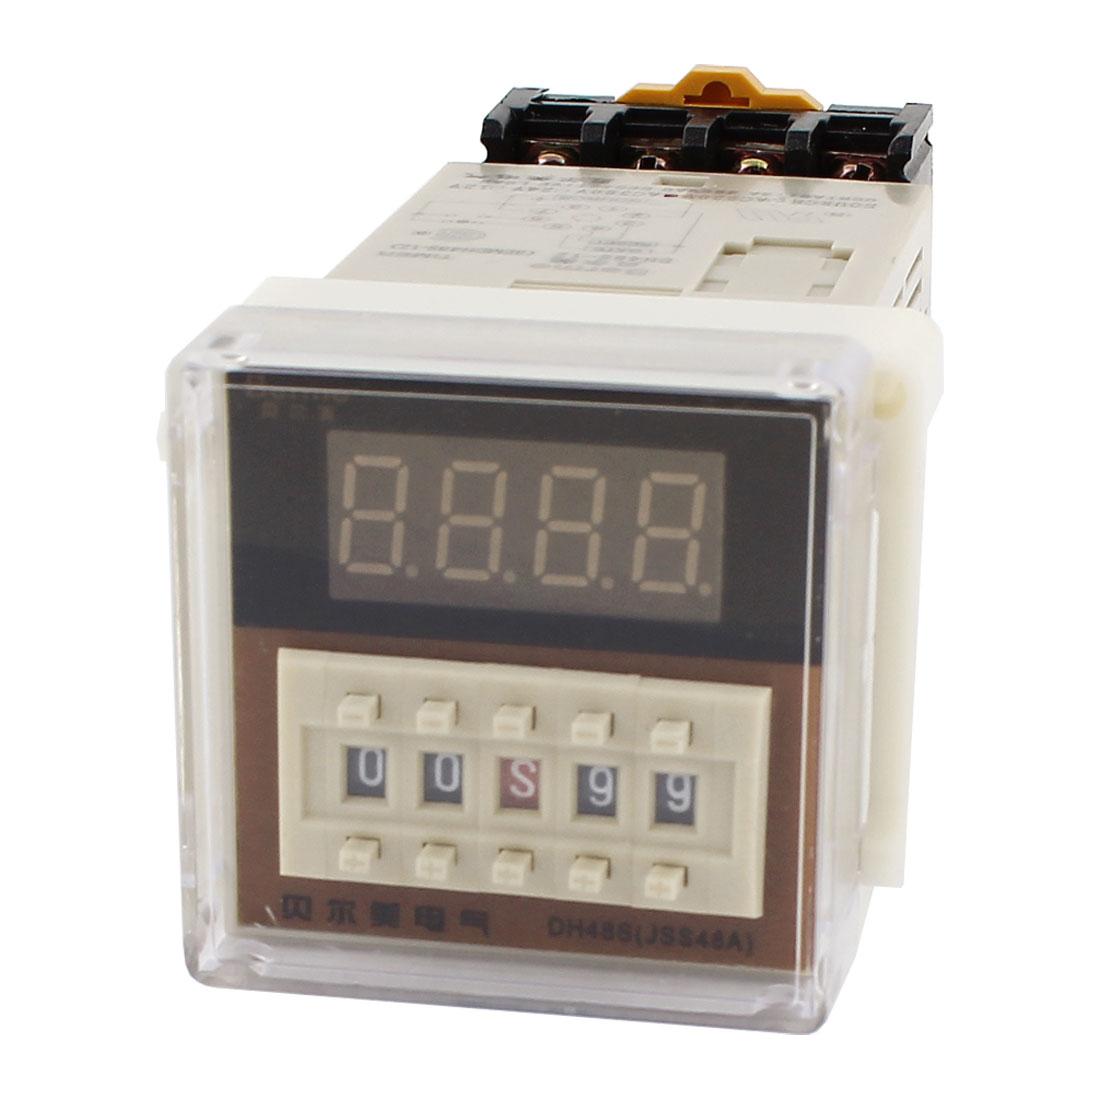 Dh48s-2Z Ac 110V 8 Pins Digital Timer Delay Relay 0.01S - 99H 99M W Socket